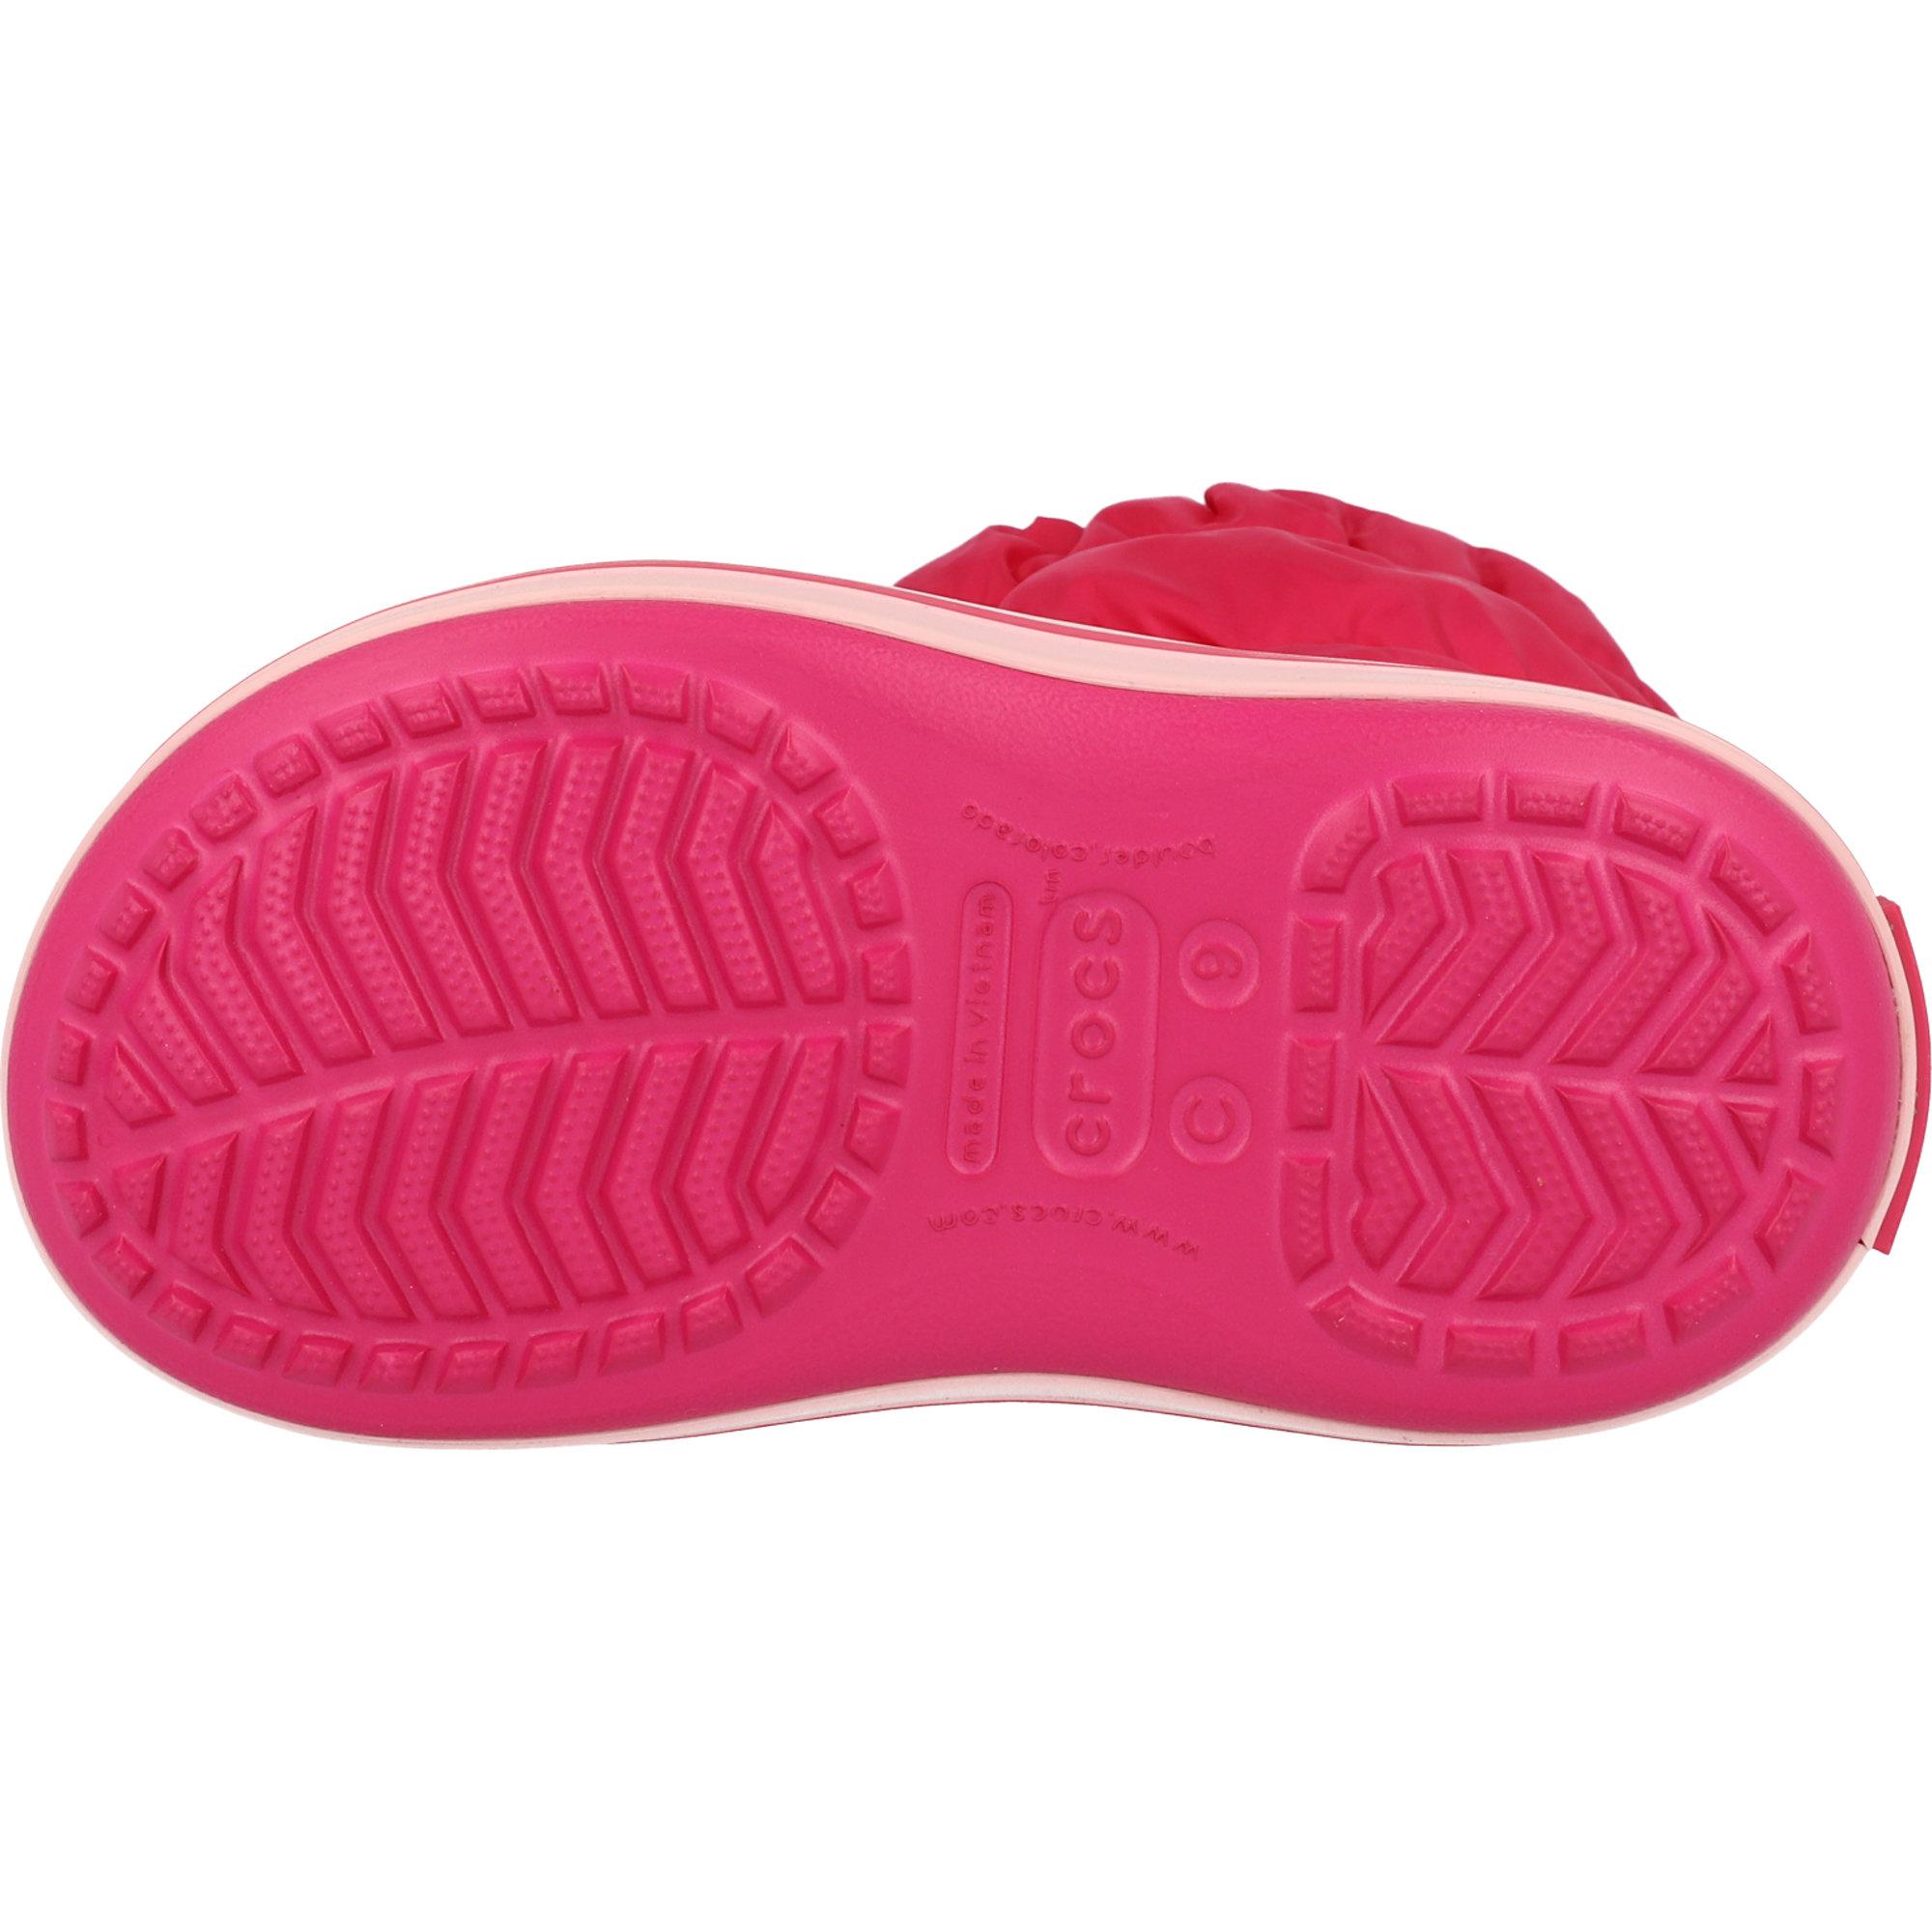 Crocs Kids Winter Puff Boot Candy Pink Nylon